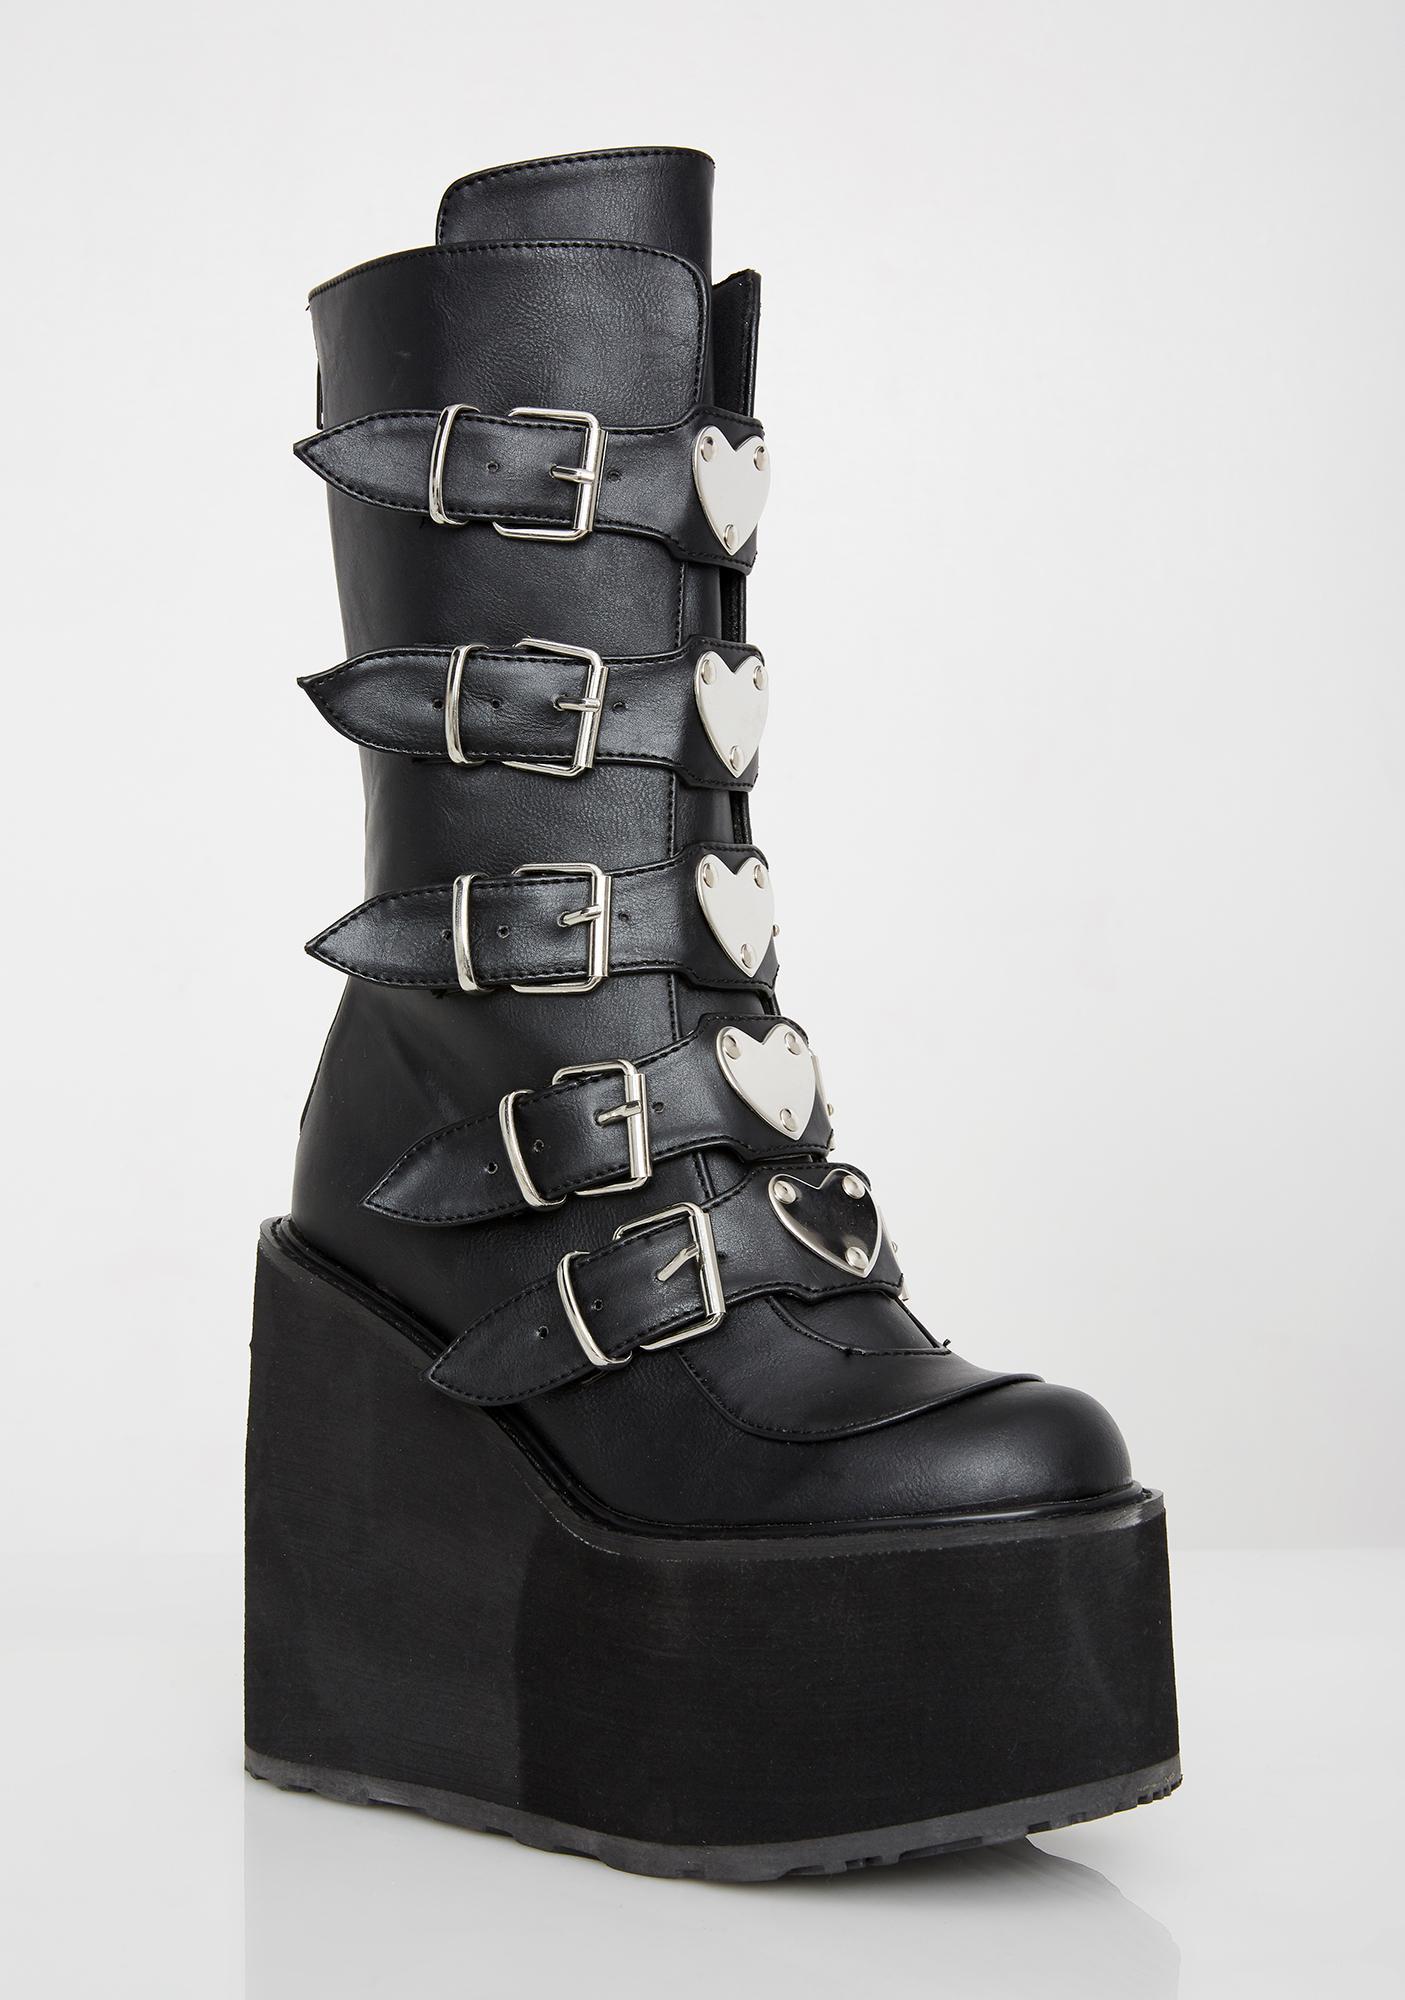 f9bc495da28 Demonia Lovesick Trinity Boots · Demonia Lovesick Trinity Boots ...